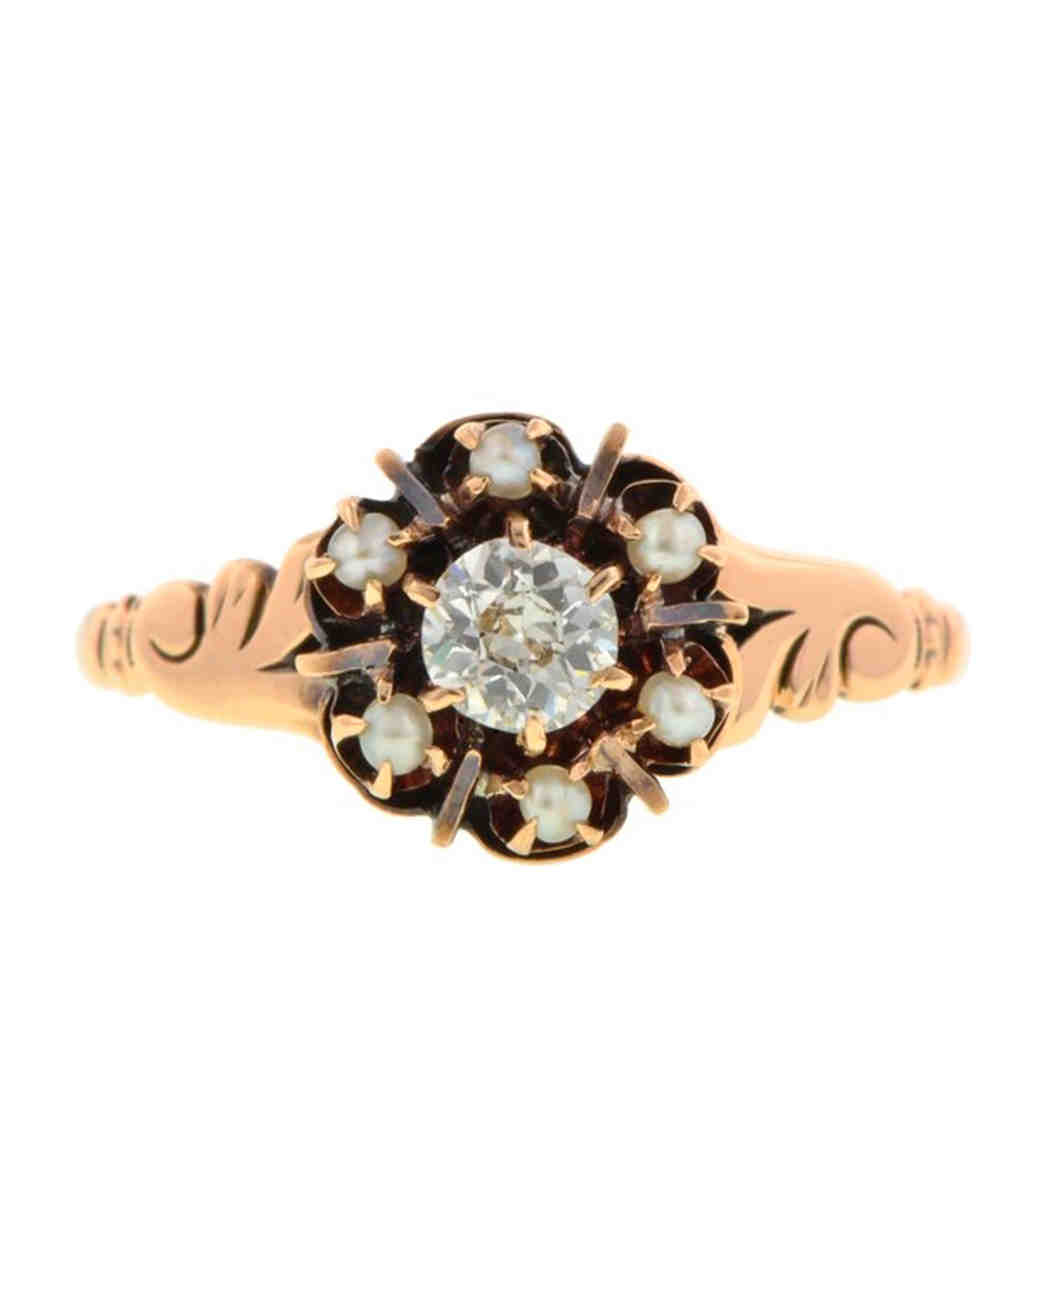 buying-vintage-engagement-ring-doyle-doyle-victorian-pearl-diamond-0215.jpg